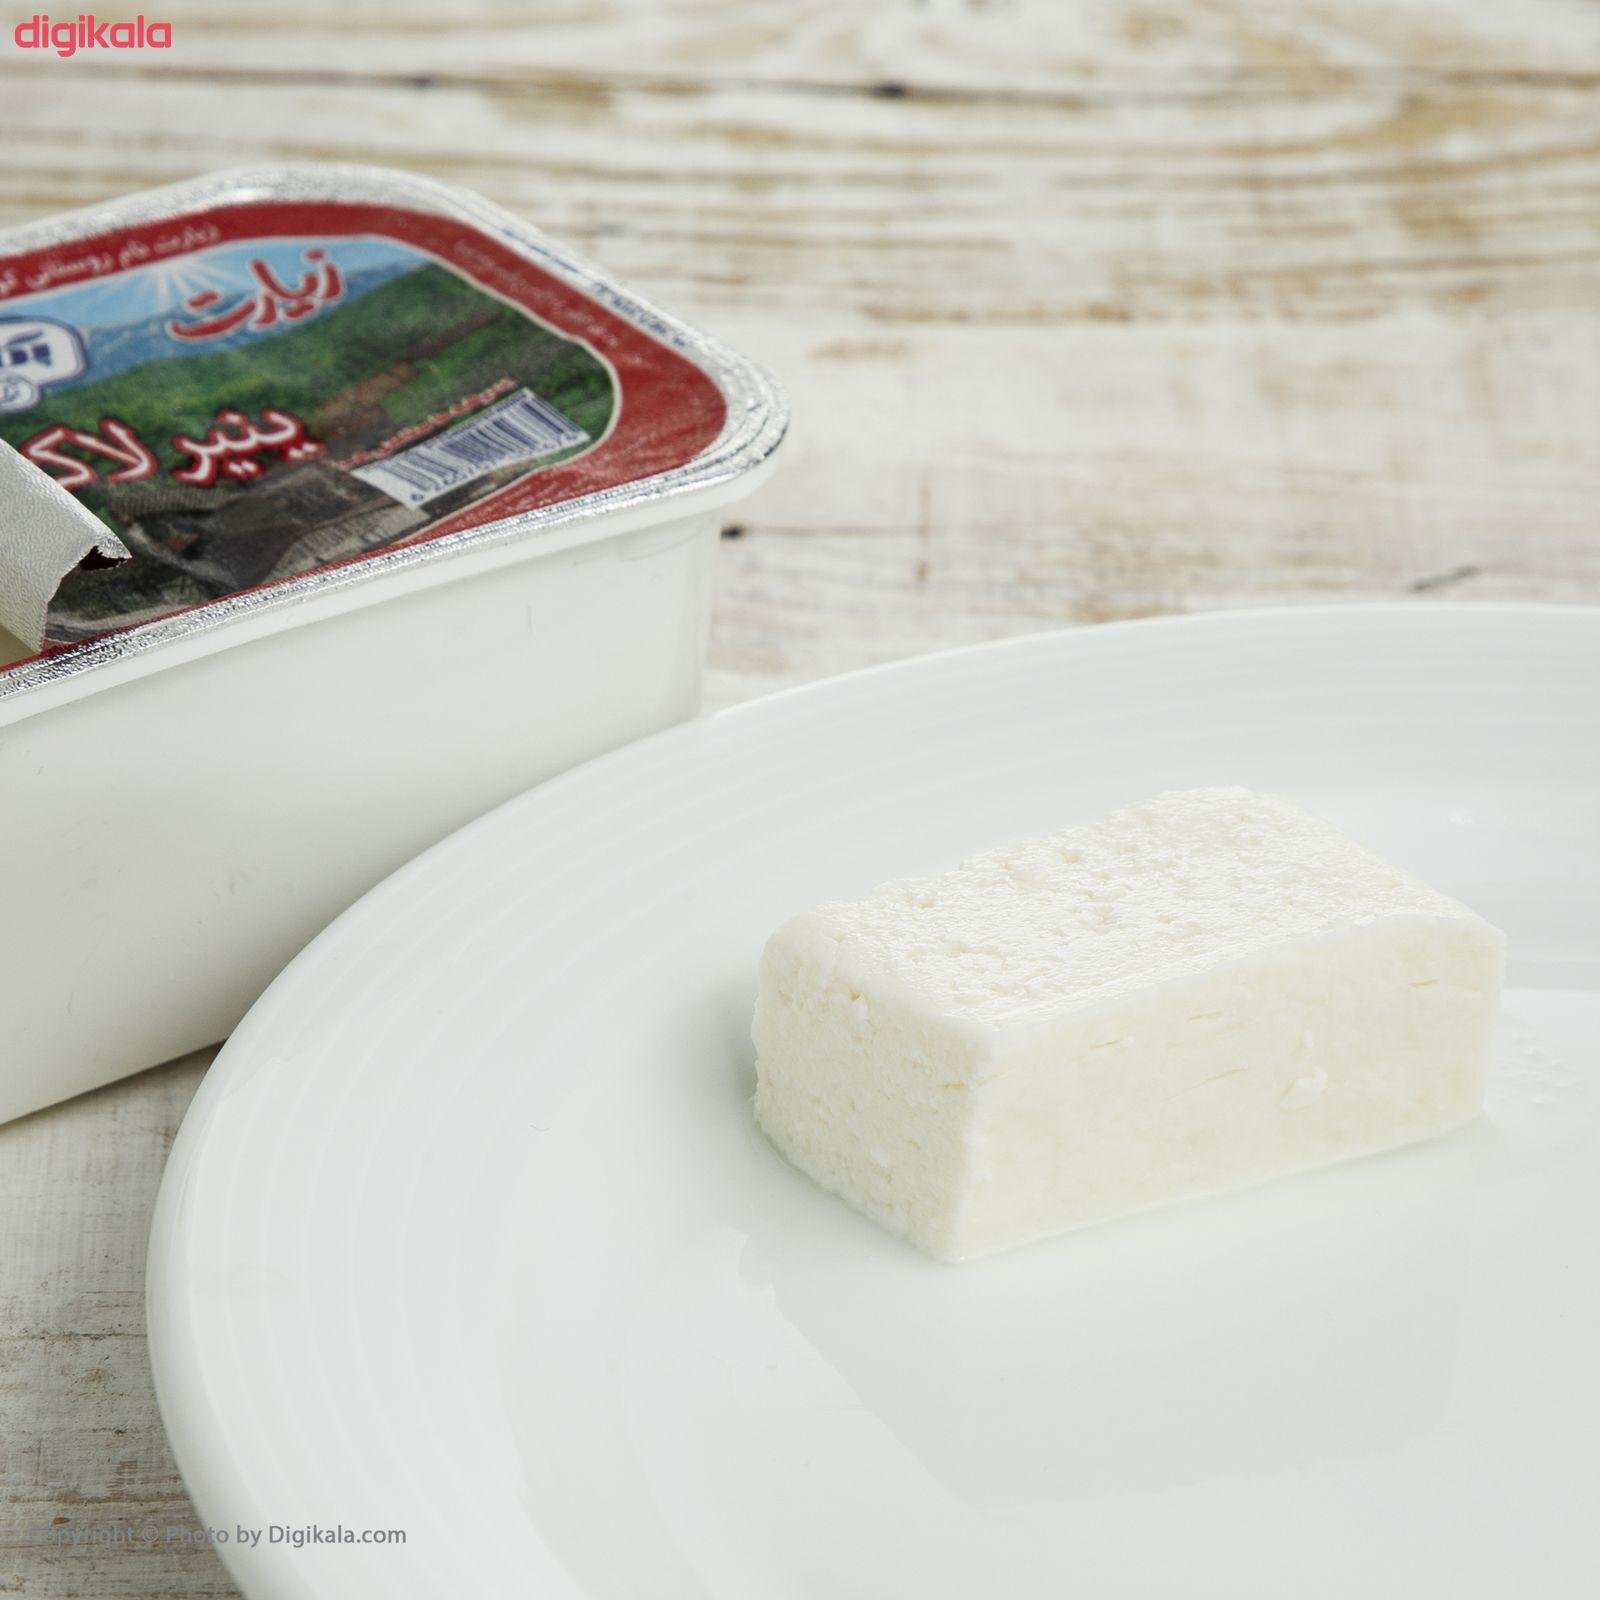 پنیر لاکتیکی زیارت پگاه مقدار 280 گرم main 1 6